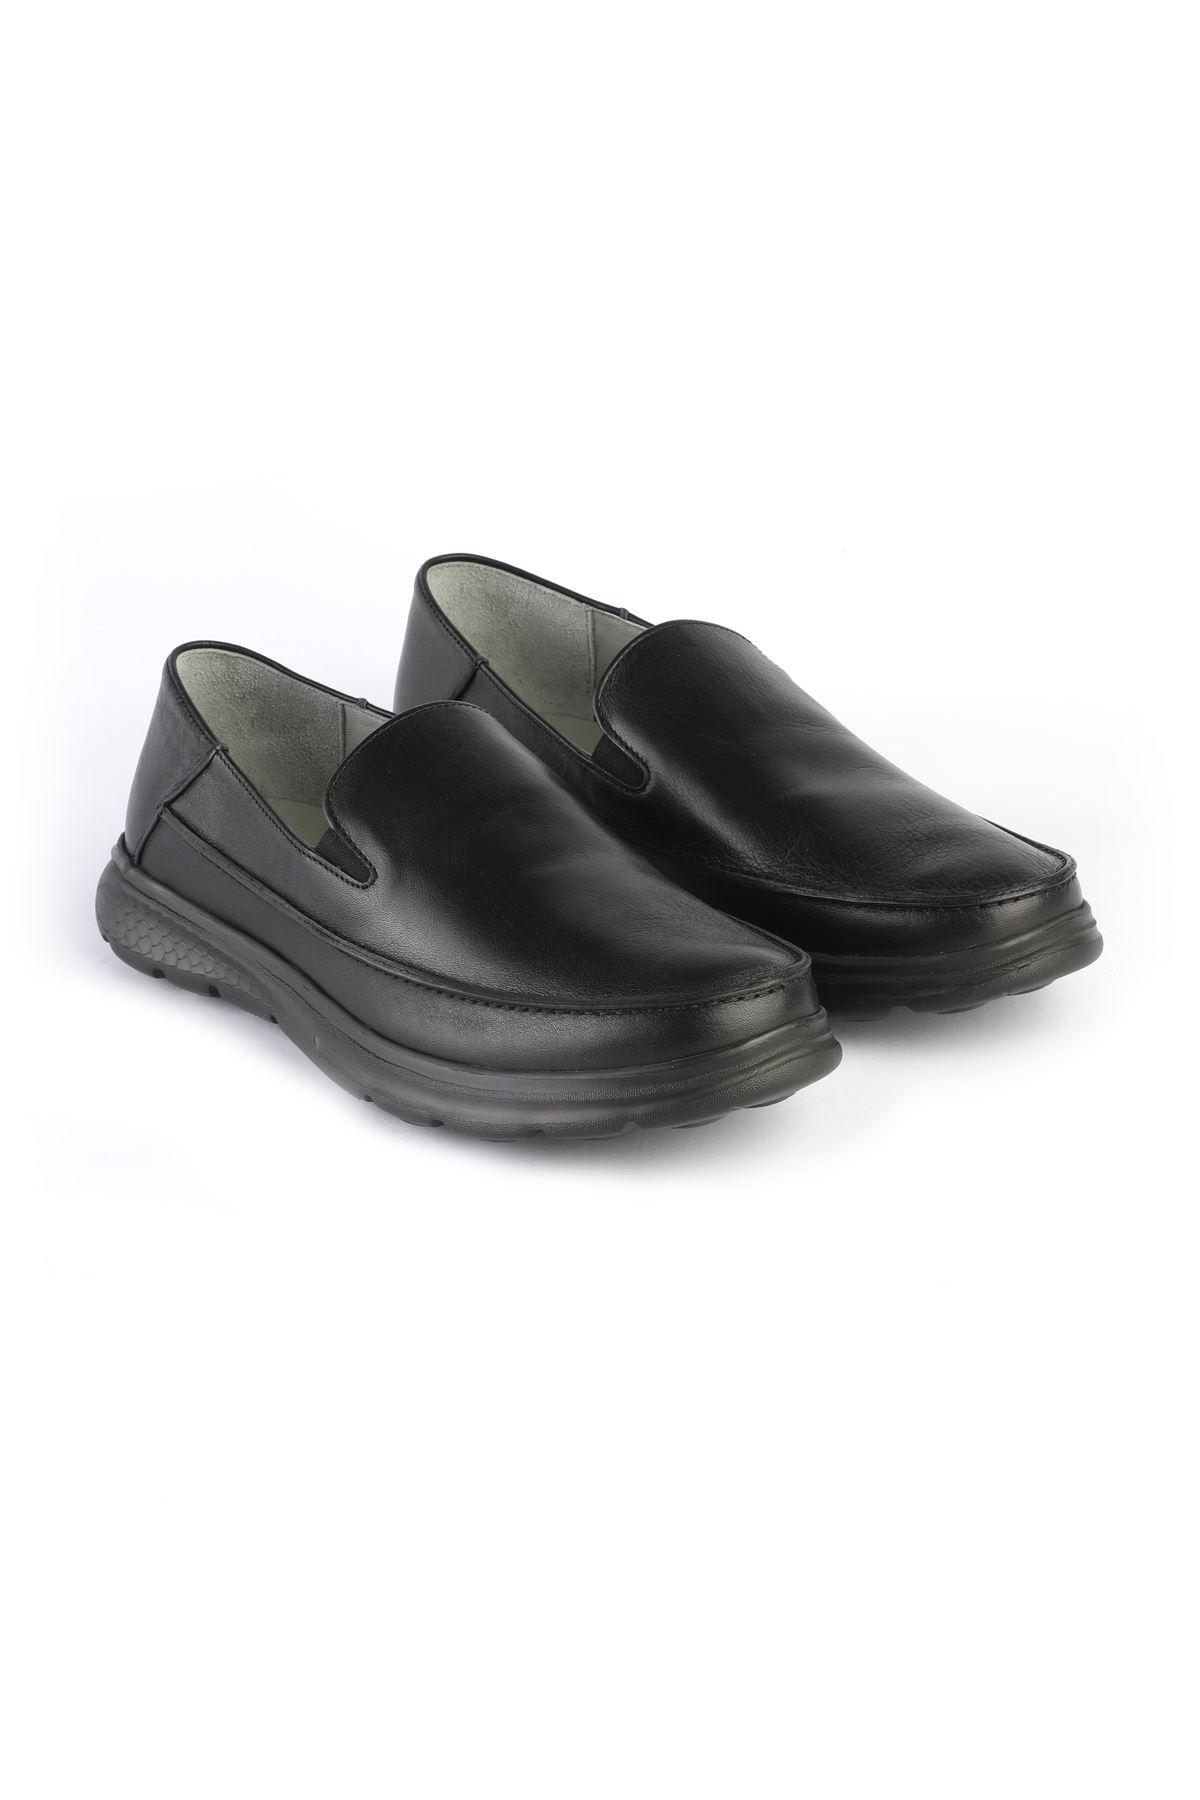 Libero 3223 Black Loafer Shoes